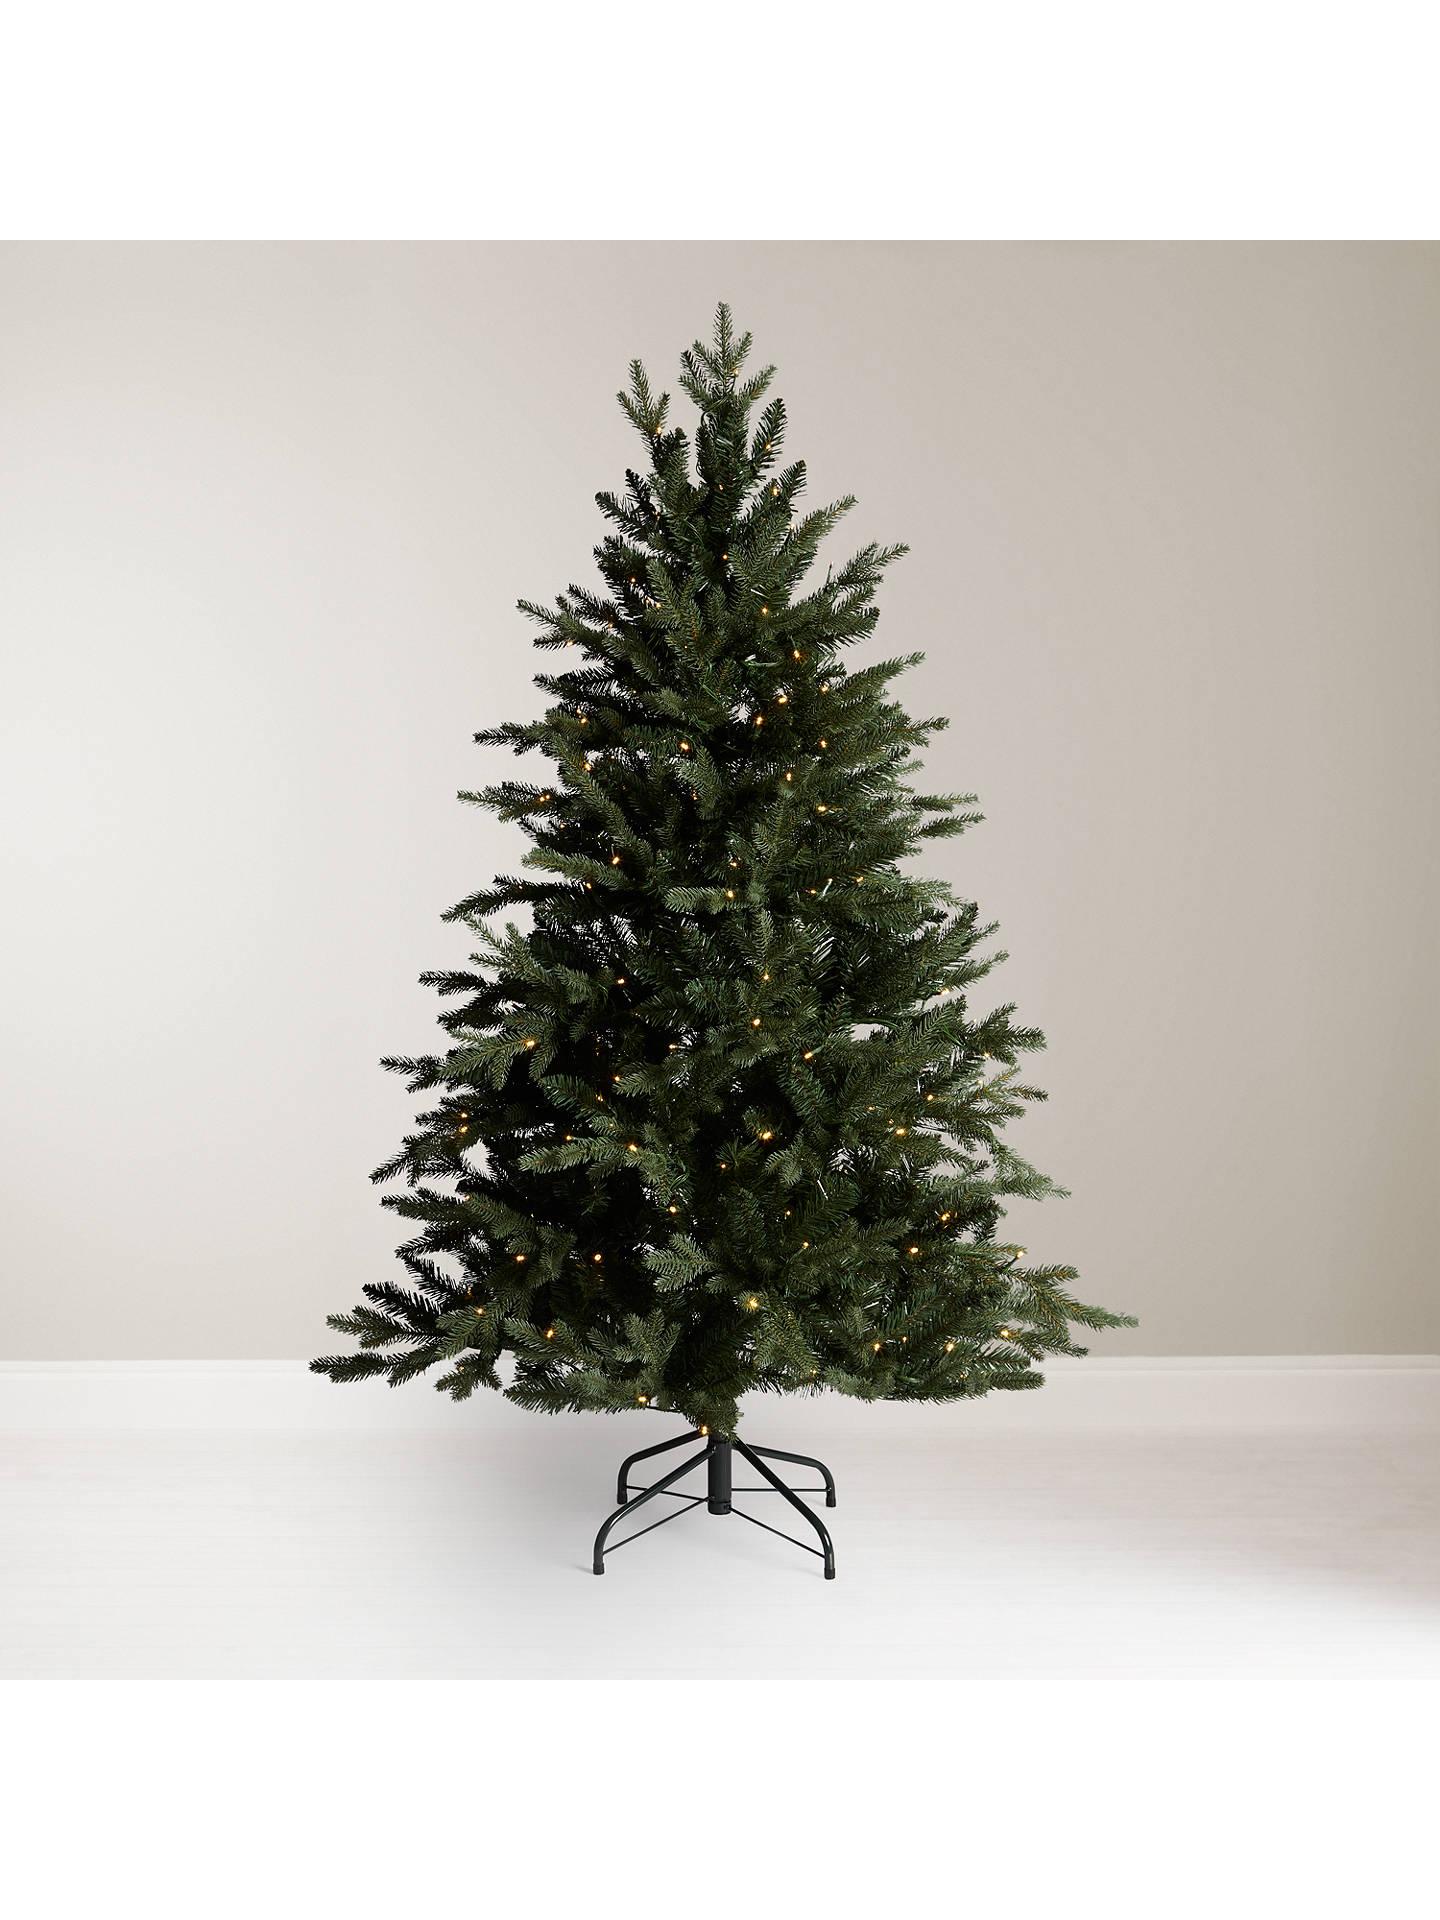 John Lewis & Partners Kensington Pre-lit Christmas Tree, 7ft at John Lewis & Partners